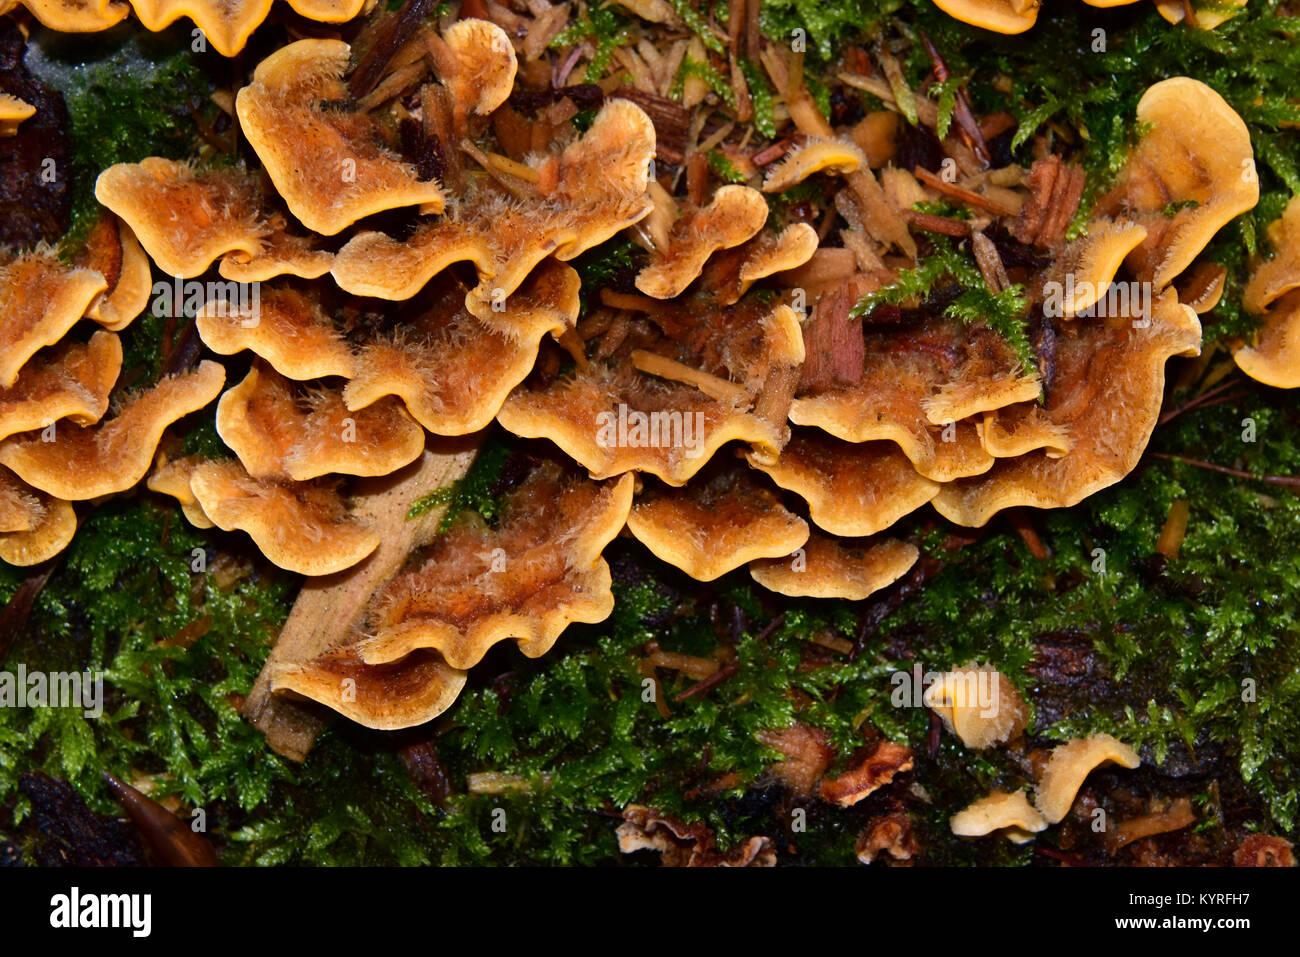 Hairy Stereum (Stereum hirsuitum) plant  pathogen mushroom on wood - Stock Image